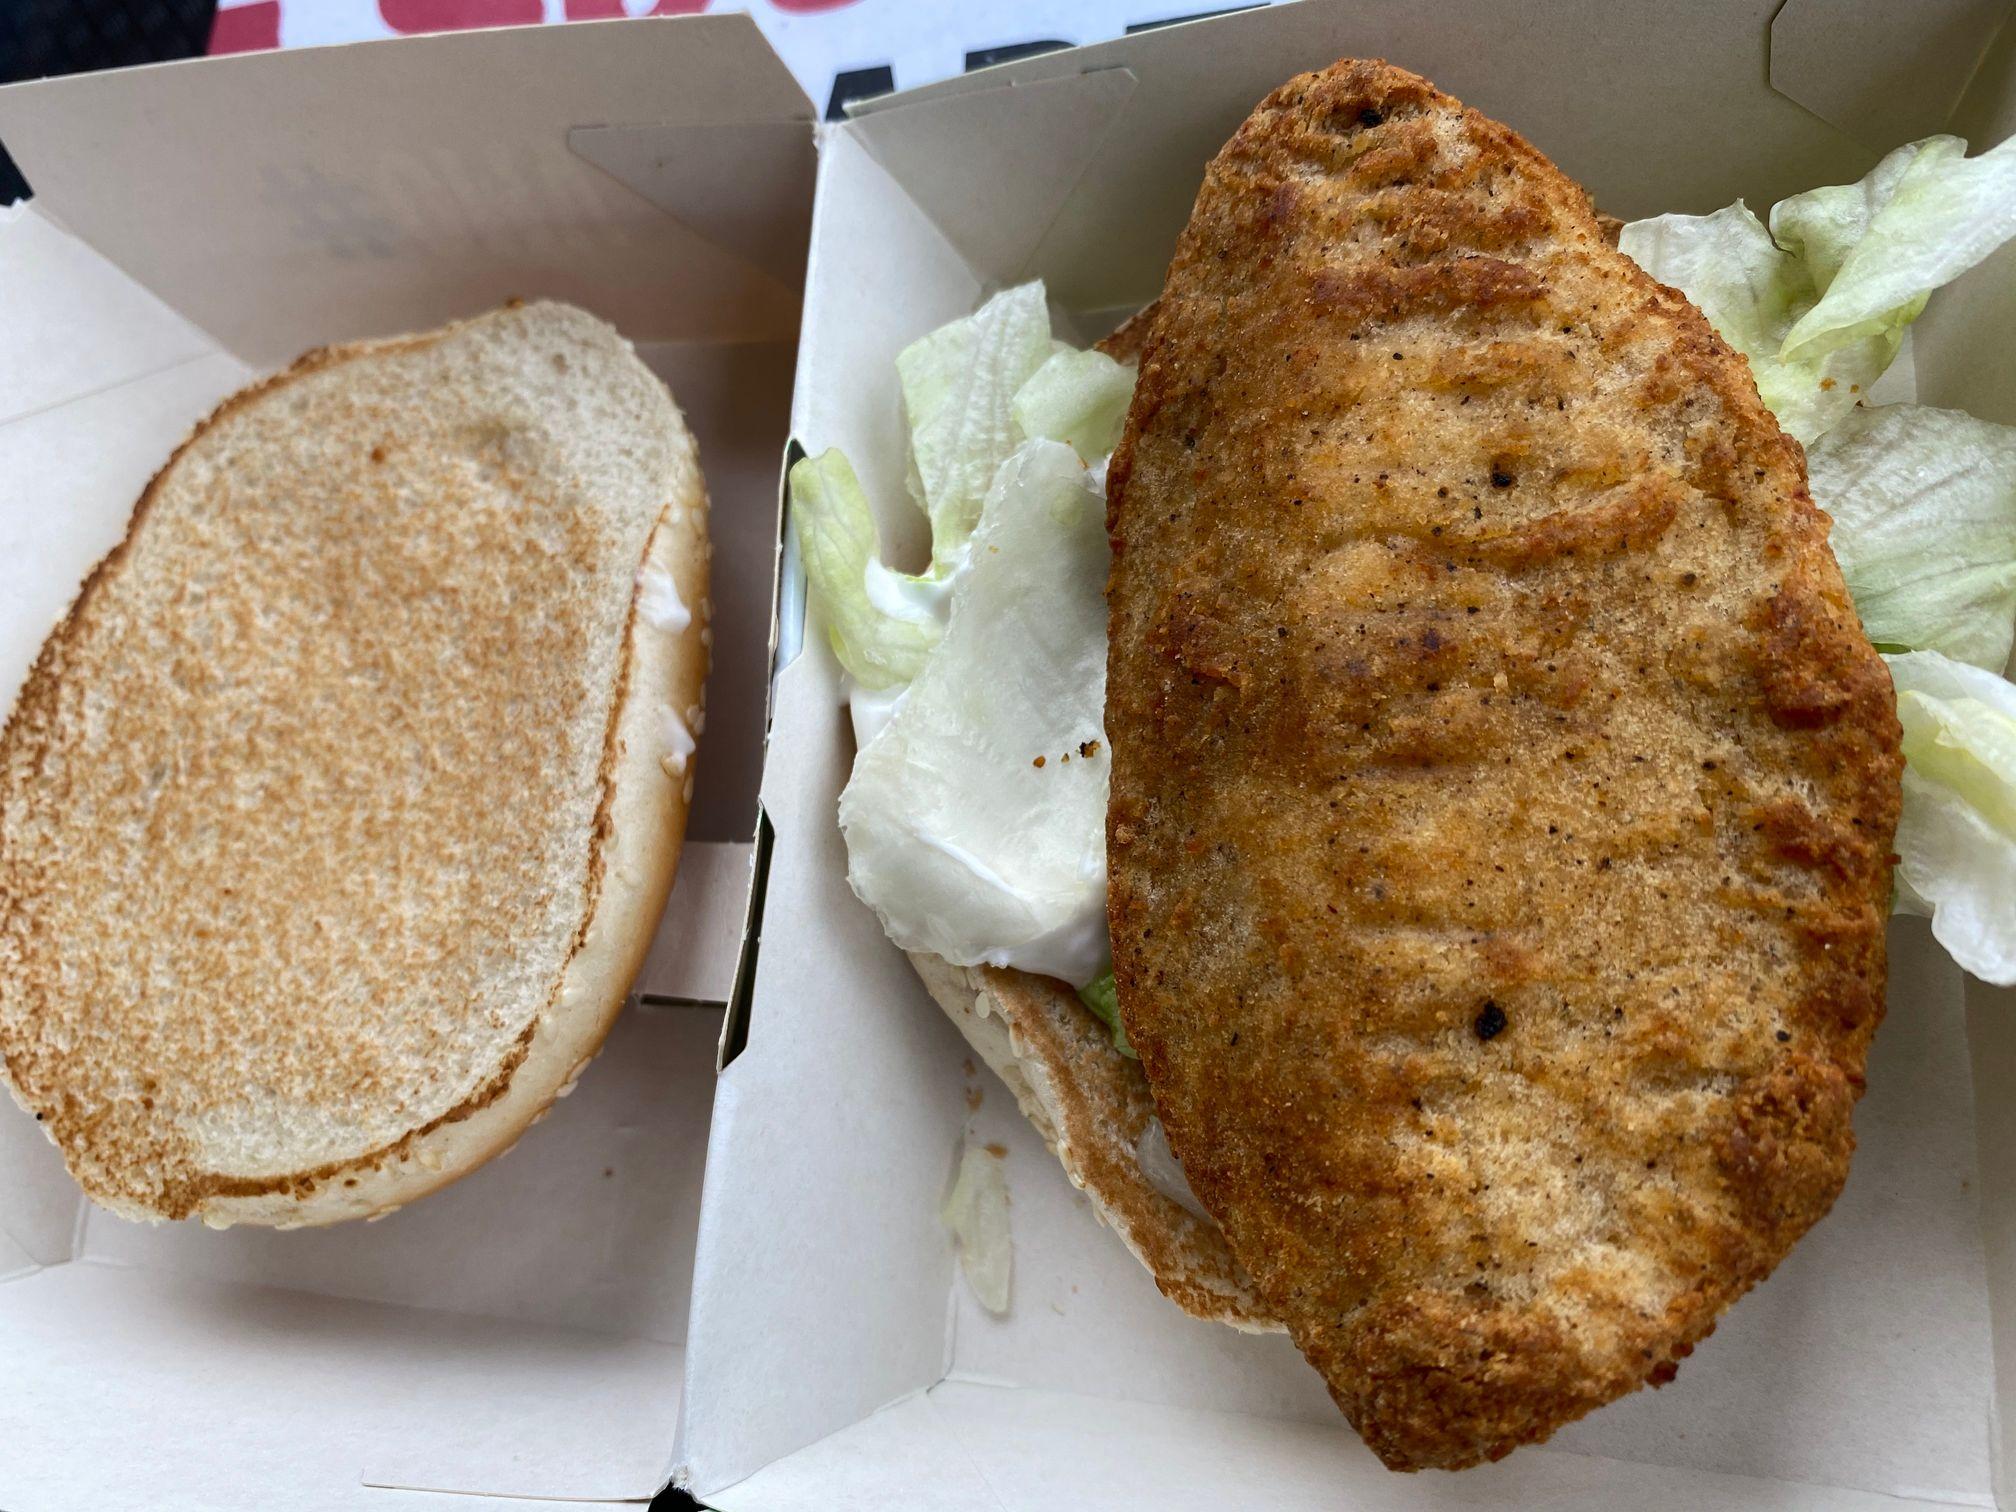 KFC Original Recipe Vegan Burger